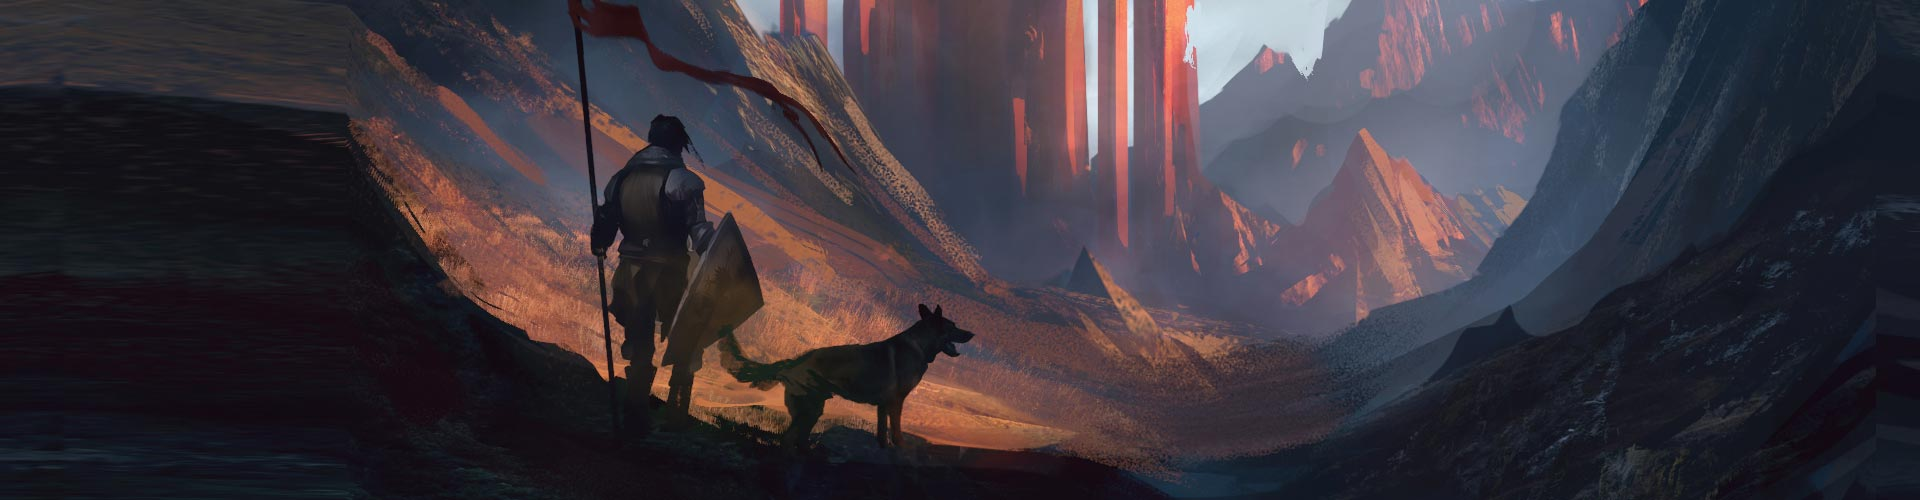 Digital painting 01